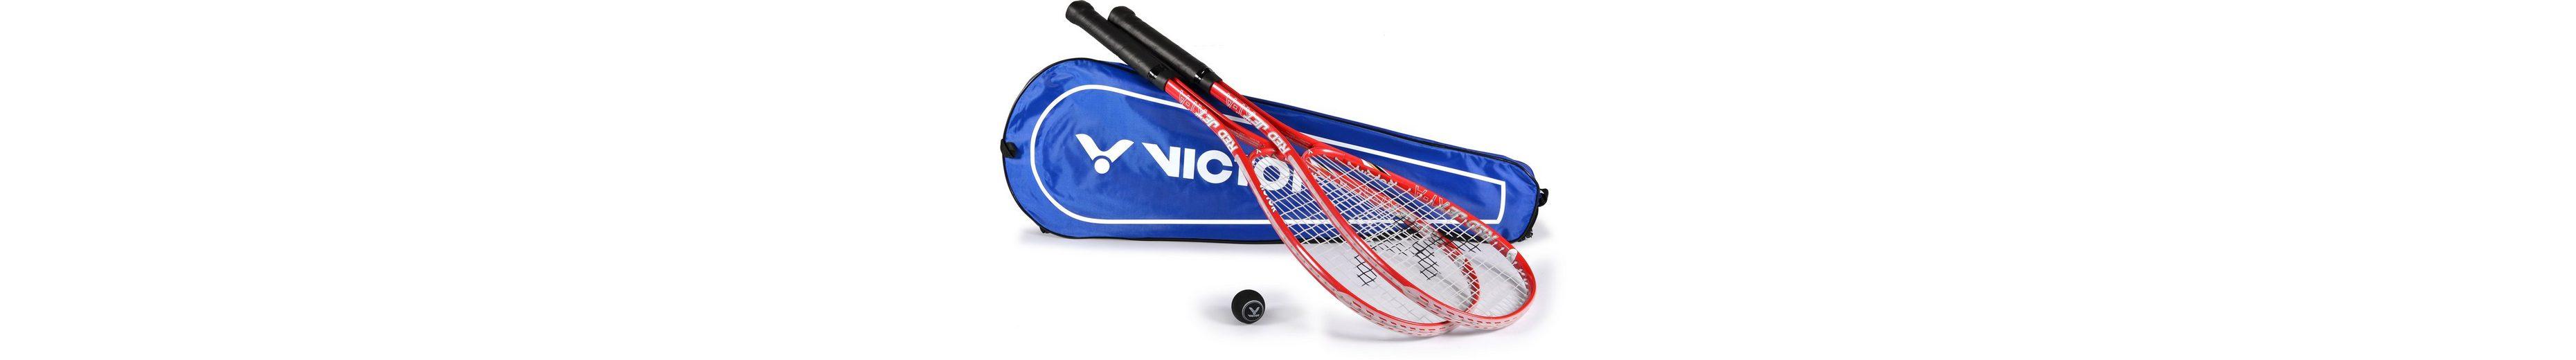 Squash Set, Victor, »Red Jet XT-A Set«